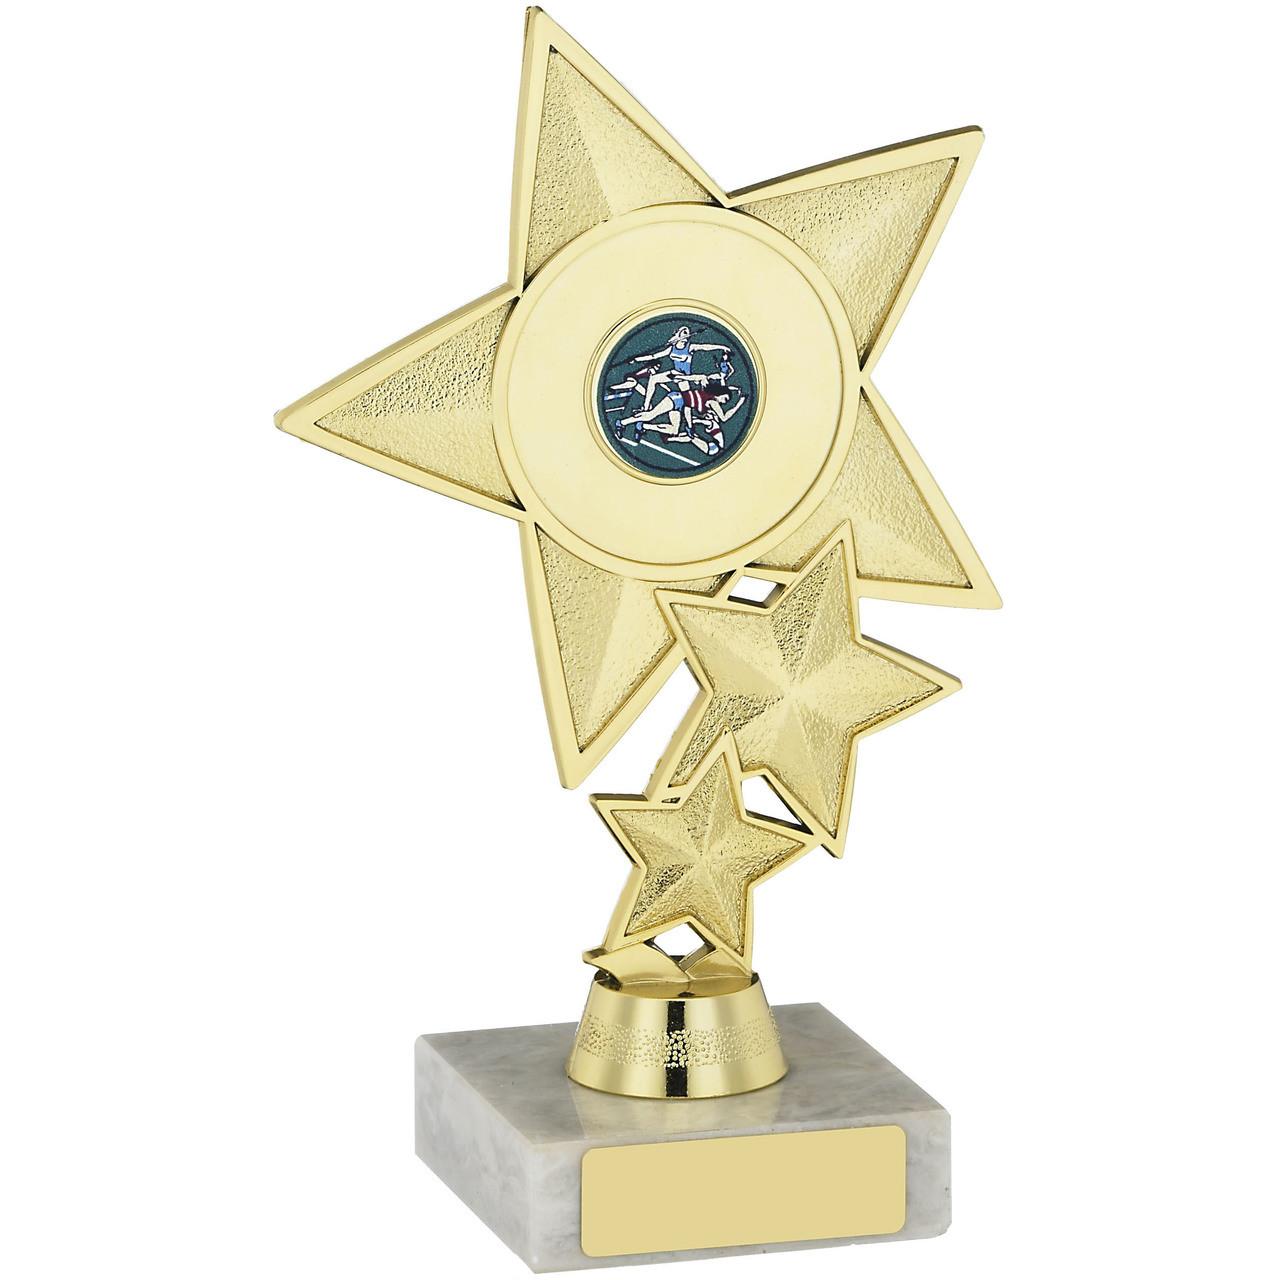 ART Award School Achievement Cup Scroll Star Budget Trophy FREE Engraving